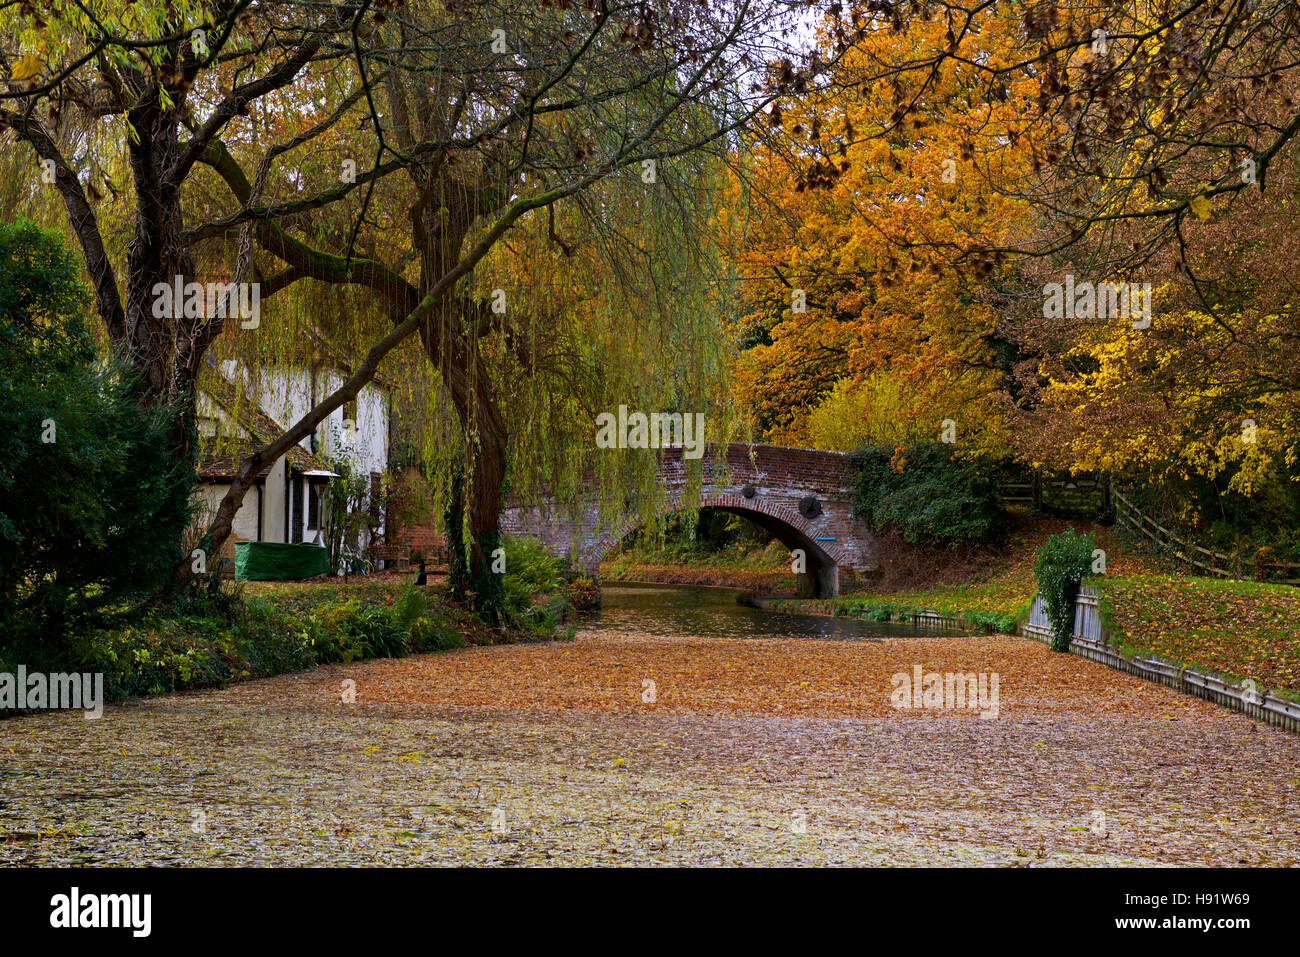 the-basingstoke-canal-at-winchfield-hampshire-england-uk-H91W69.jpg